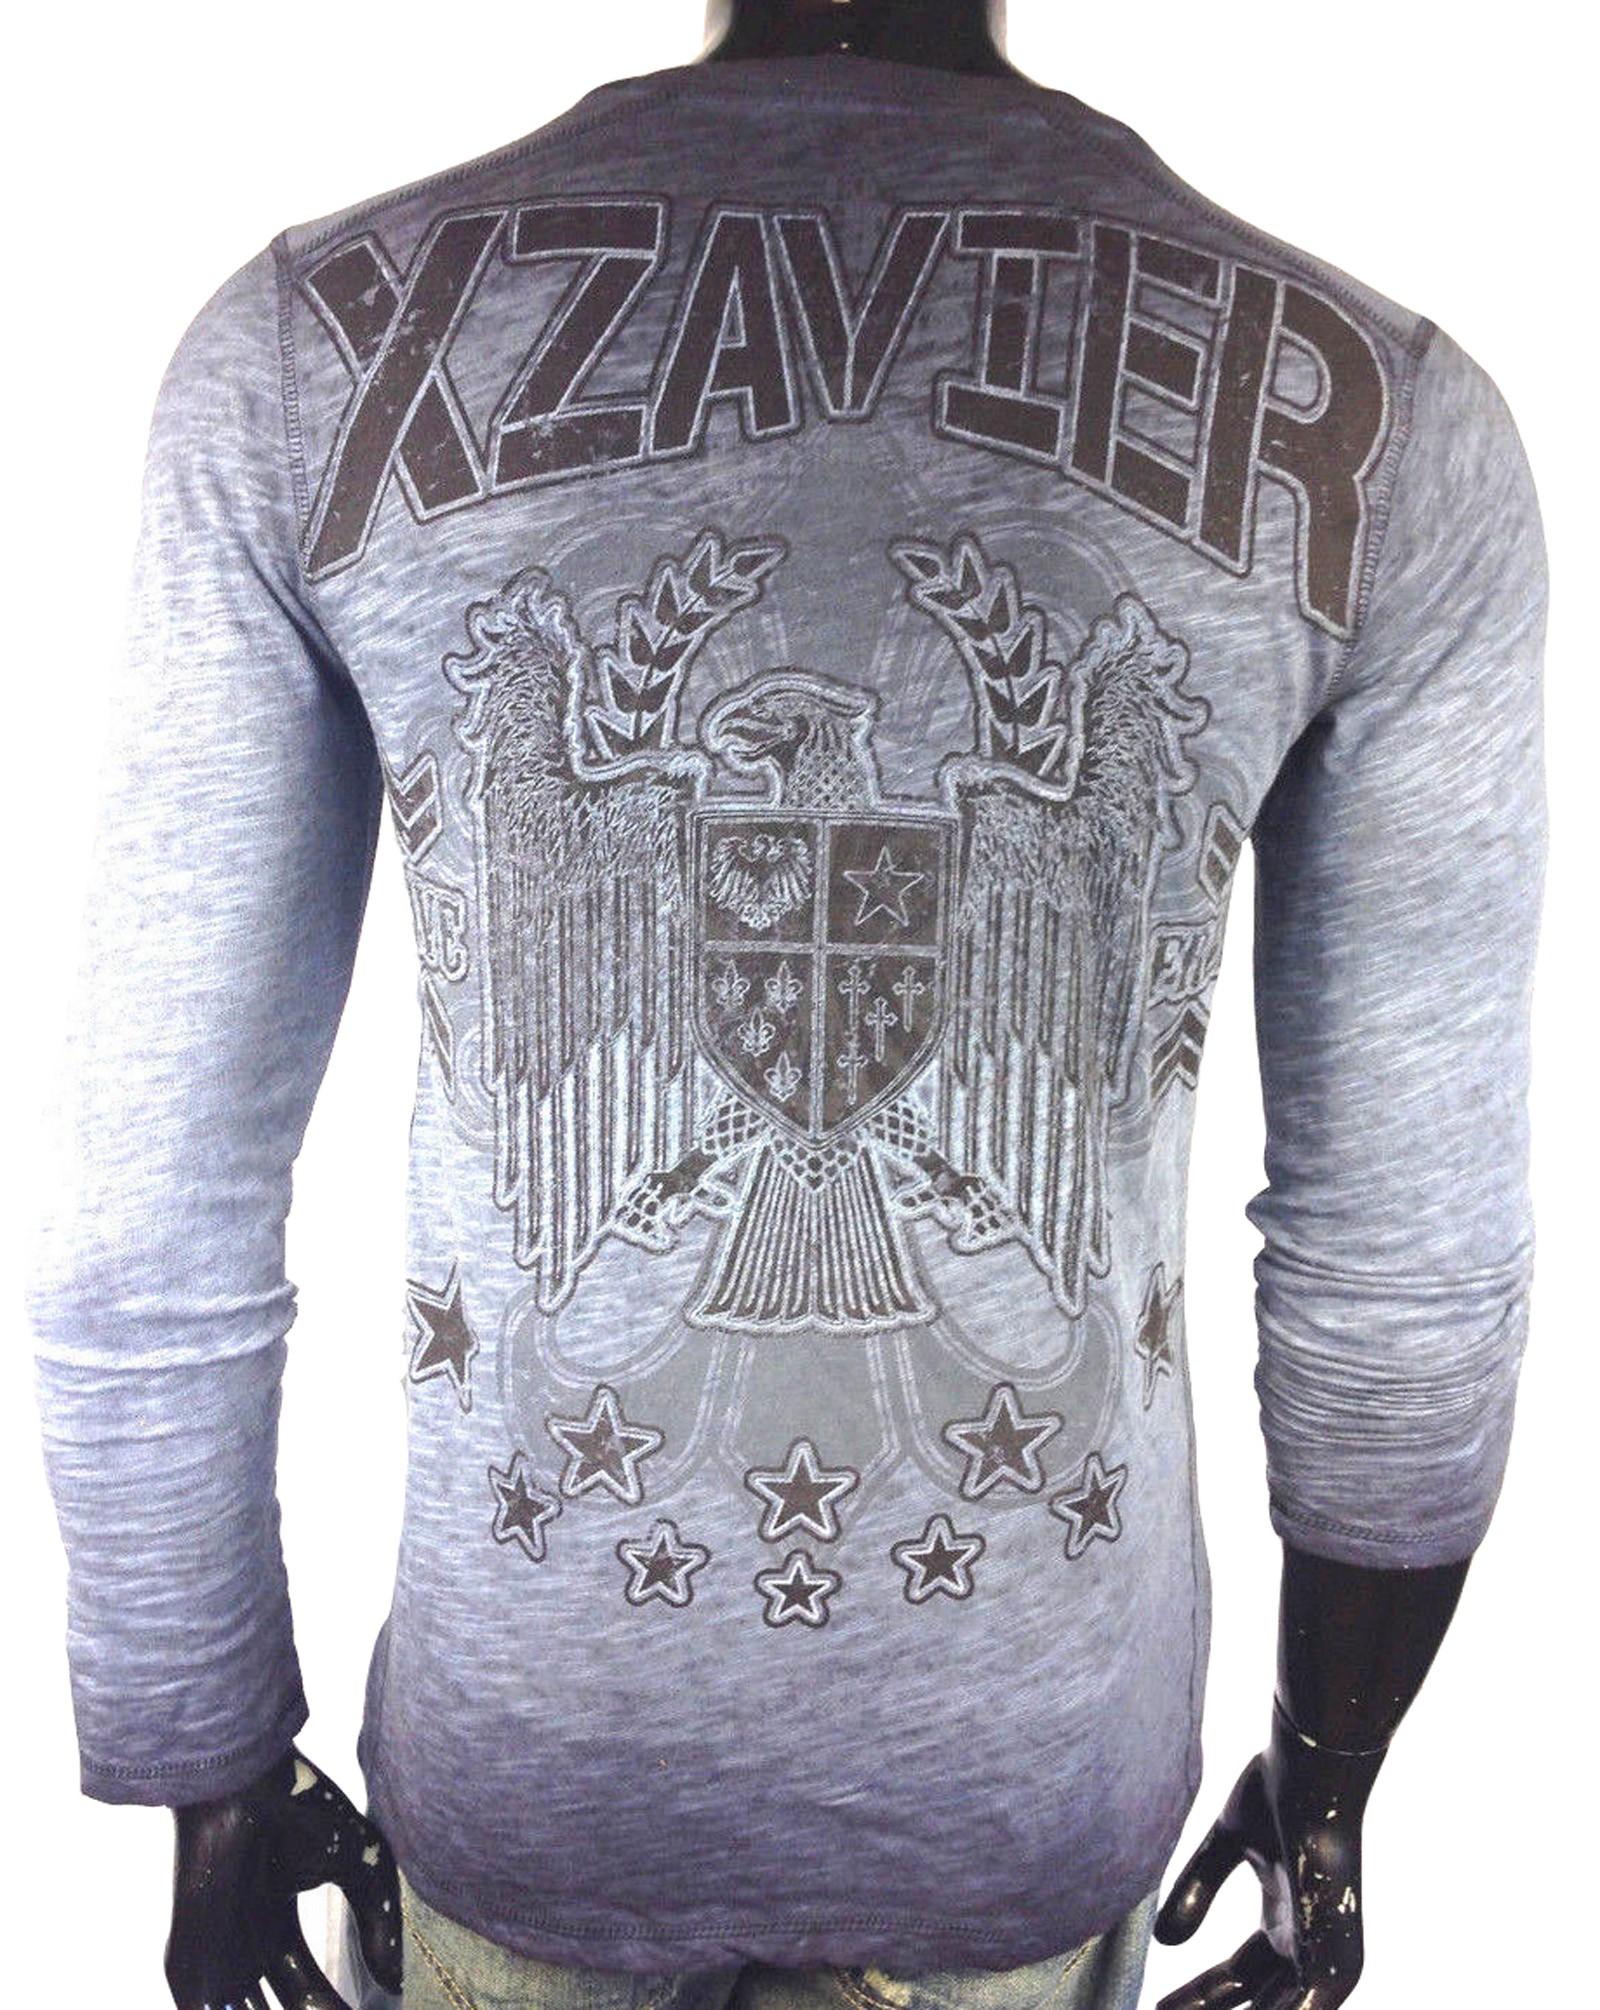 Xzavier - LIMITED Liberty Eagle Longsleeve T-Shirt